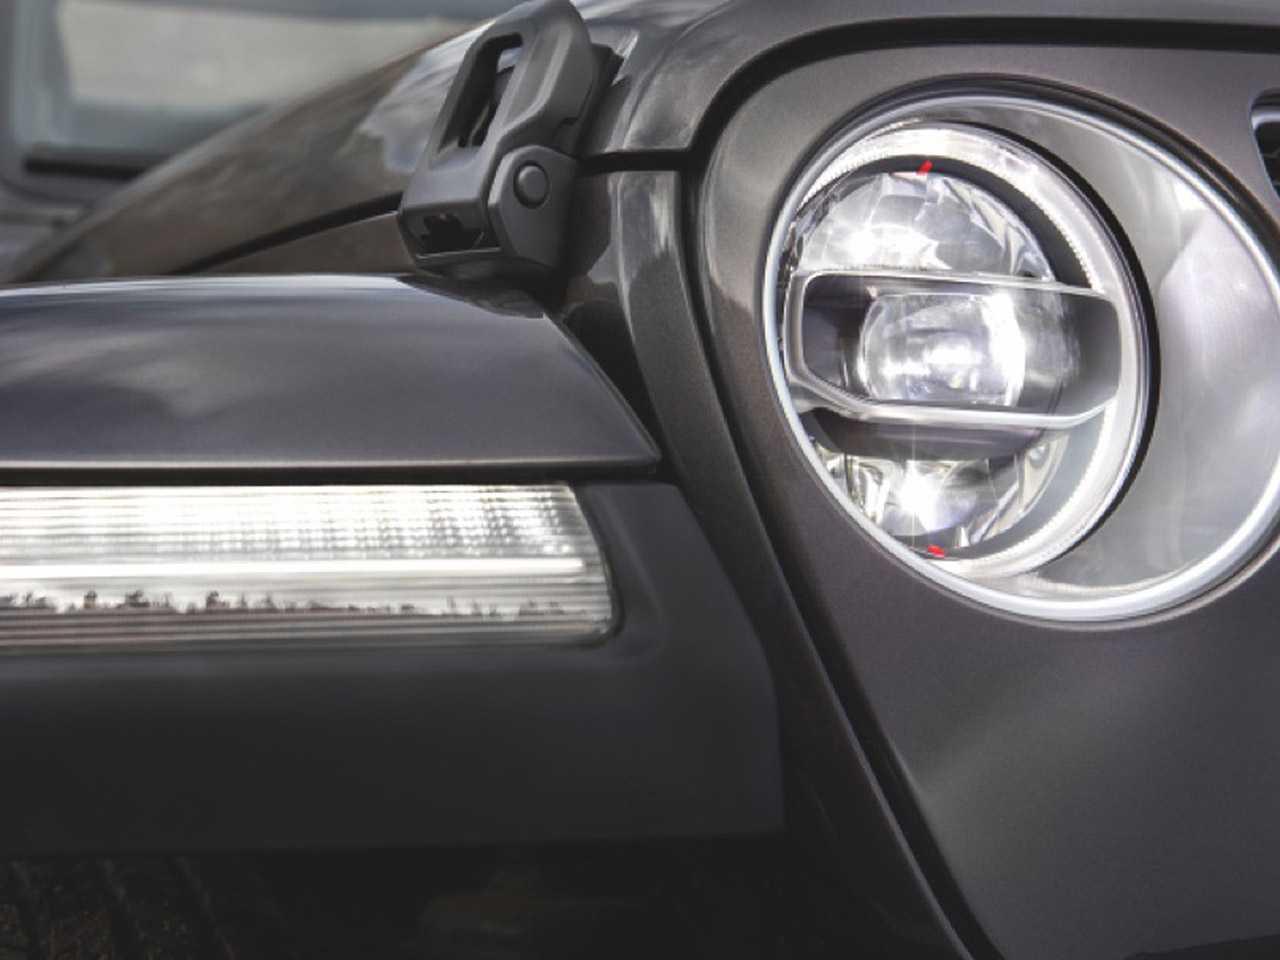 JeepWrangler 2020 - faróis